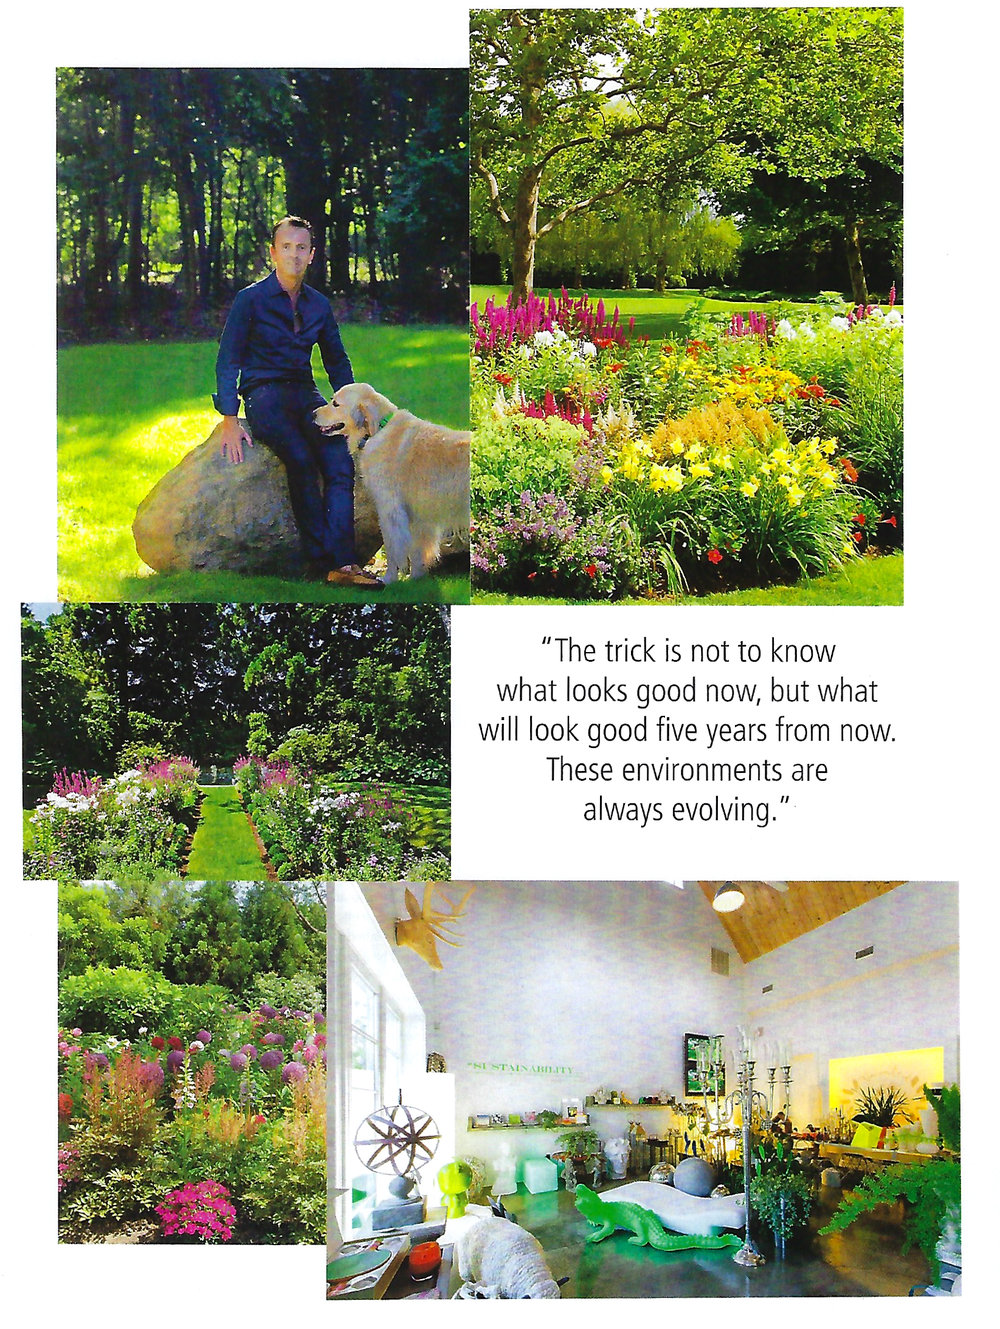 Avenue Magazine - FA Knows Good Landscaping_June 2017 2.jpg